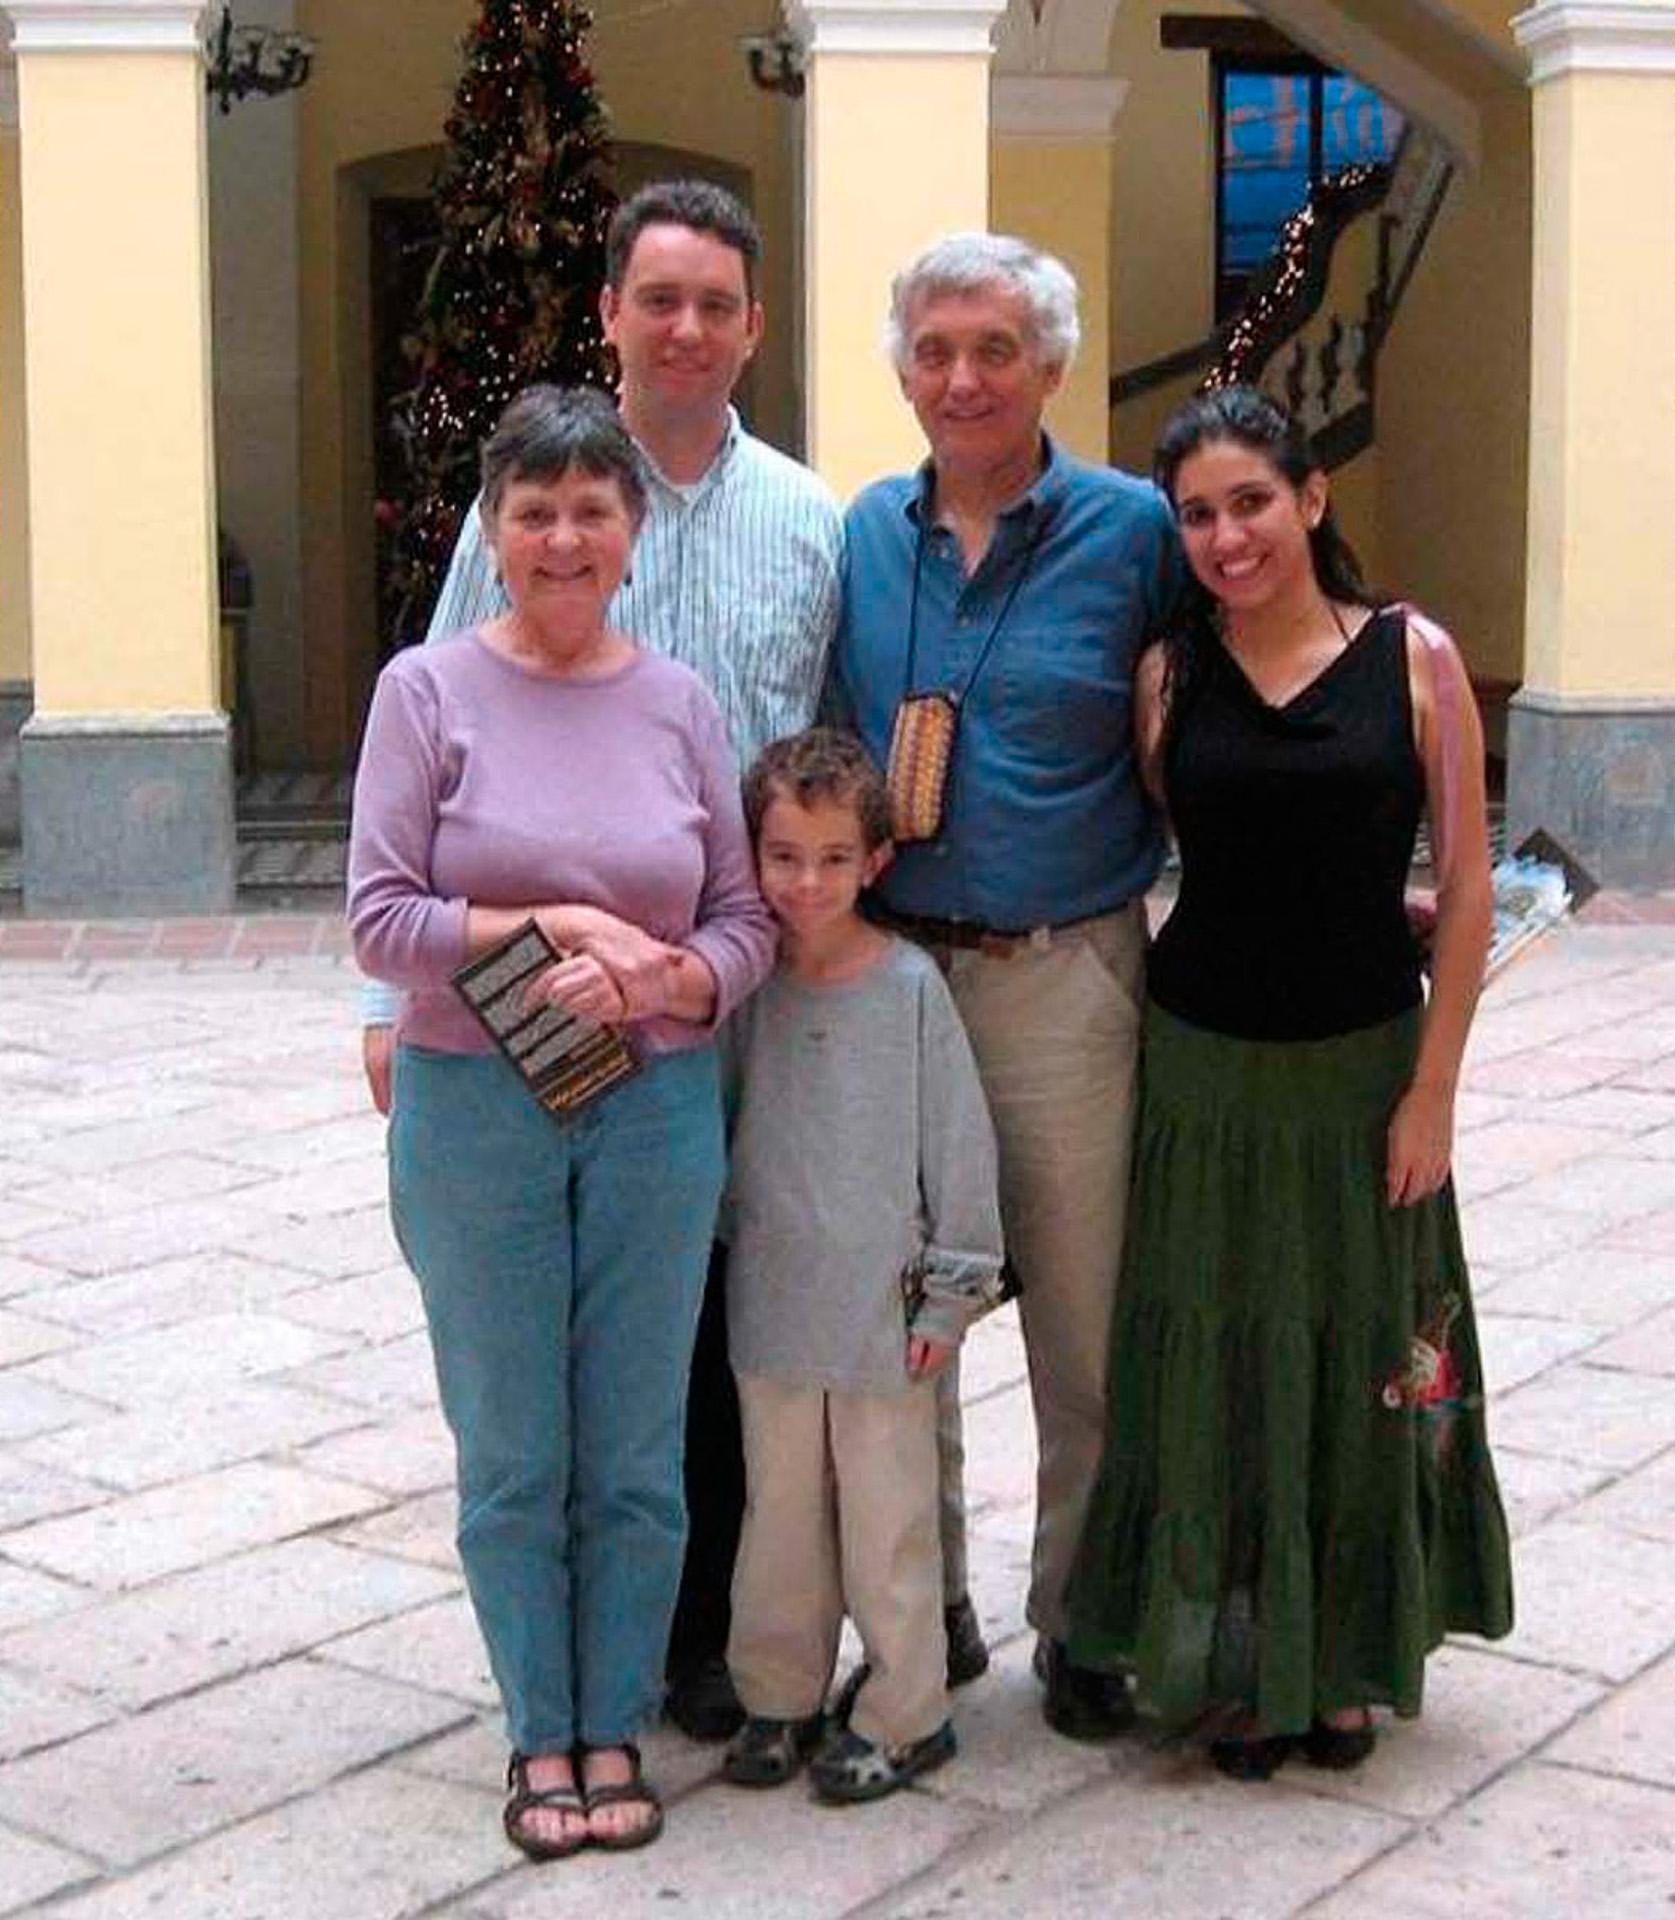 65-Presentation-Mary-Boyer-and-family_32_1200px_1920px.jpg